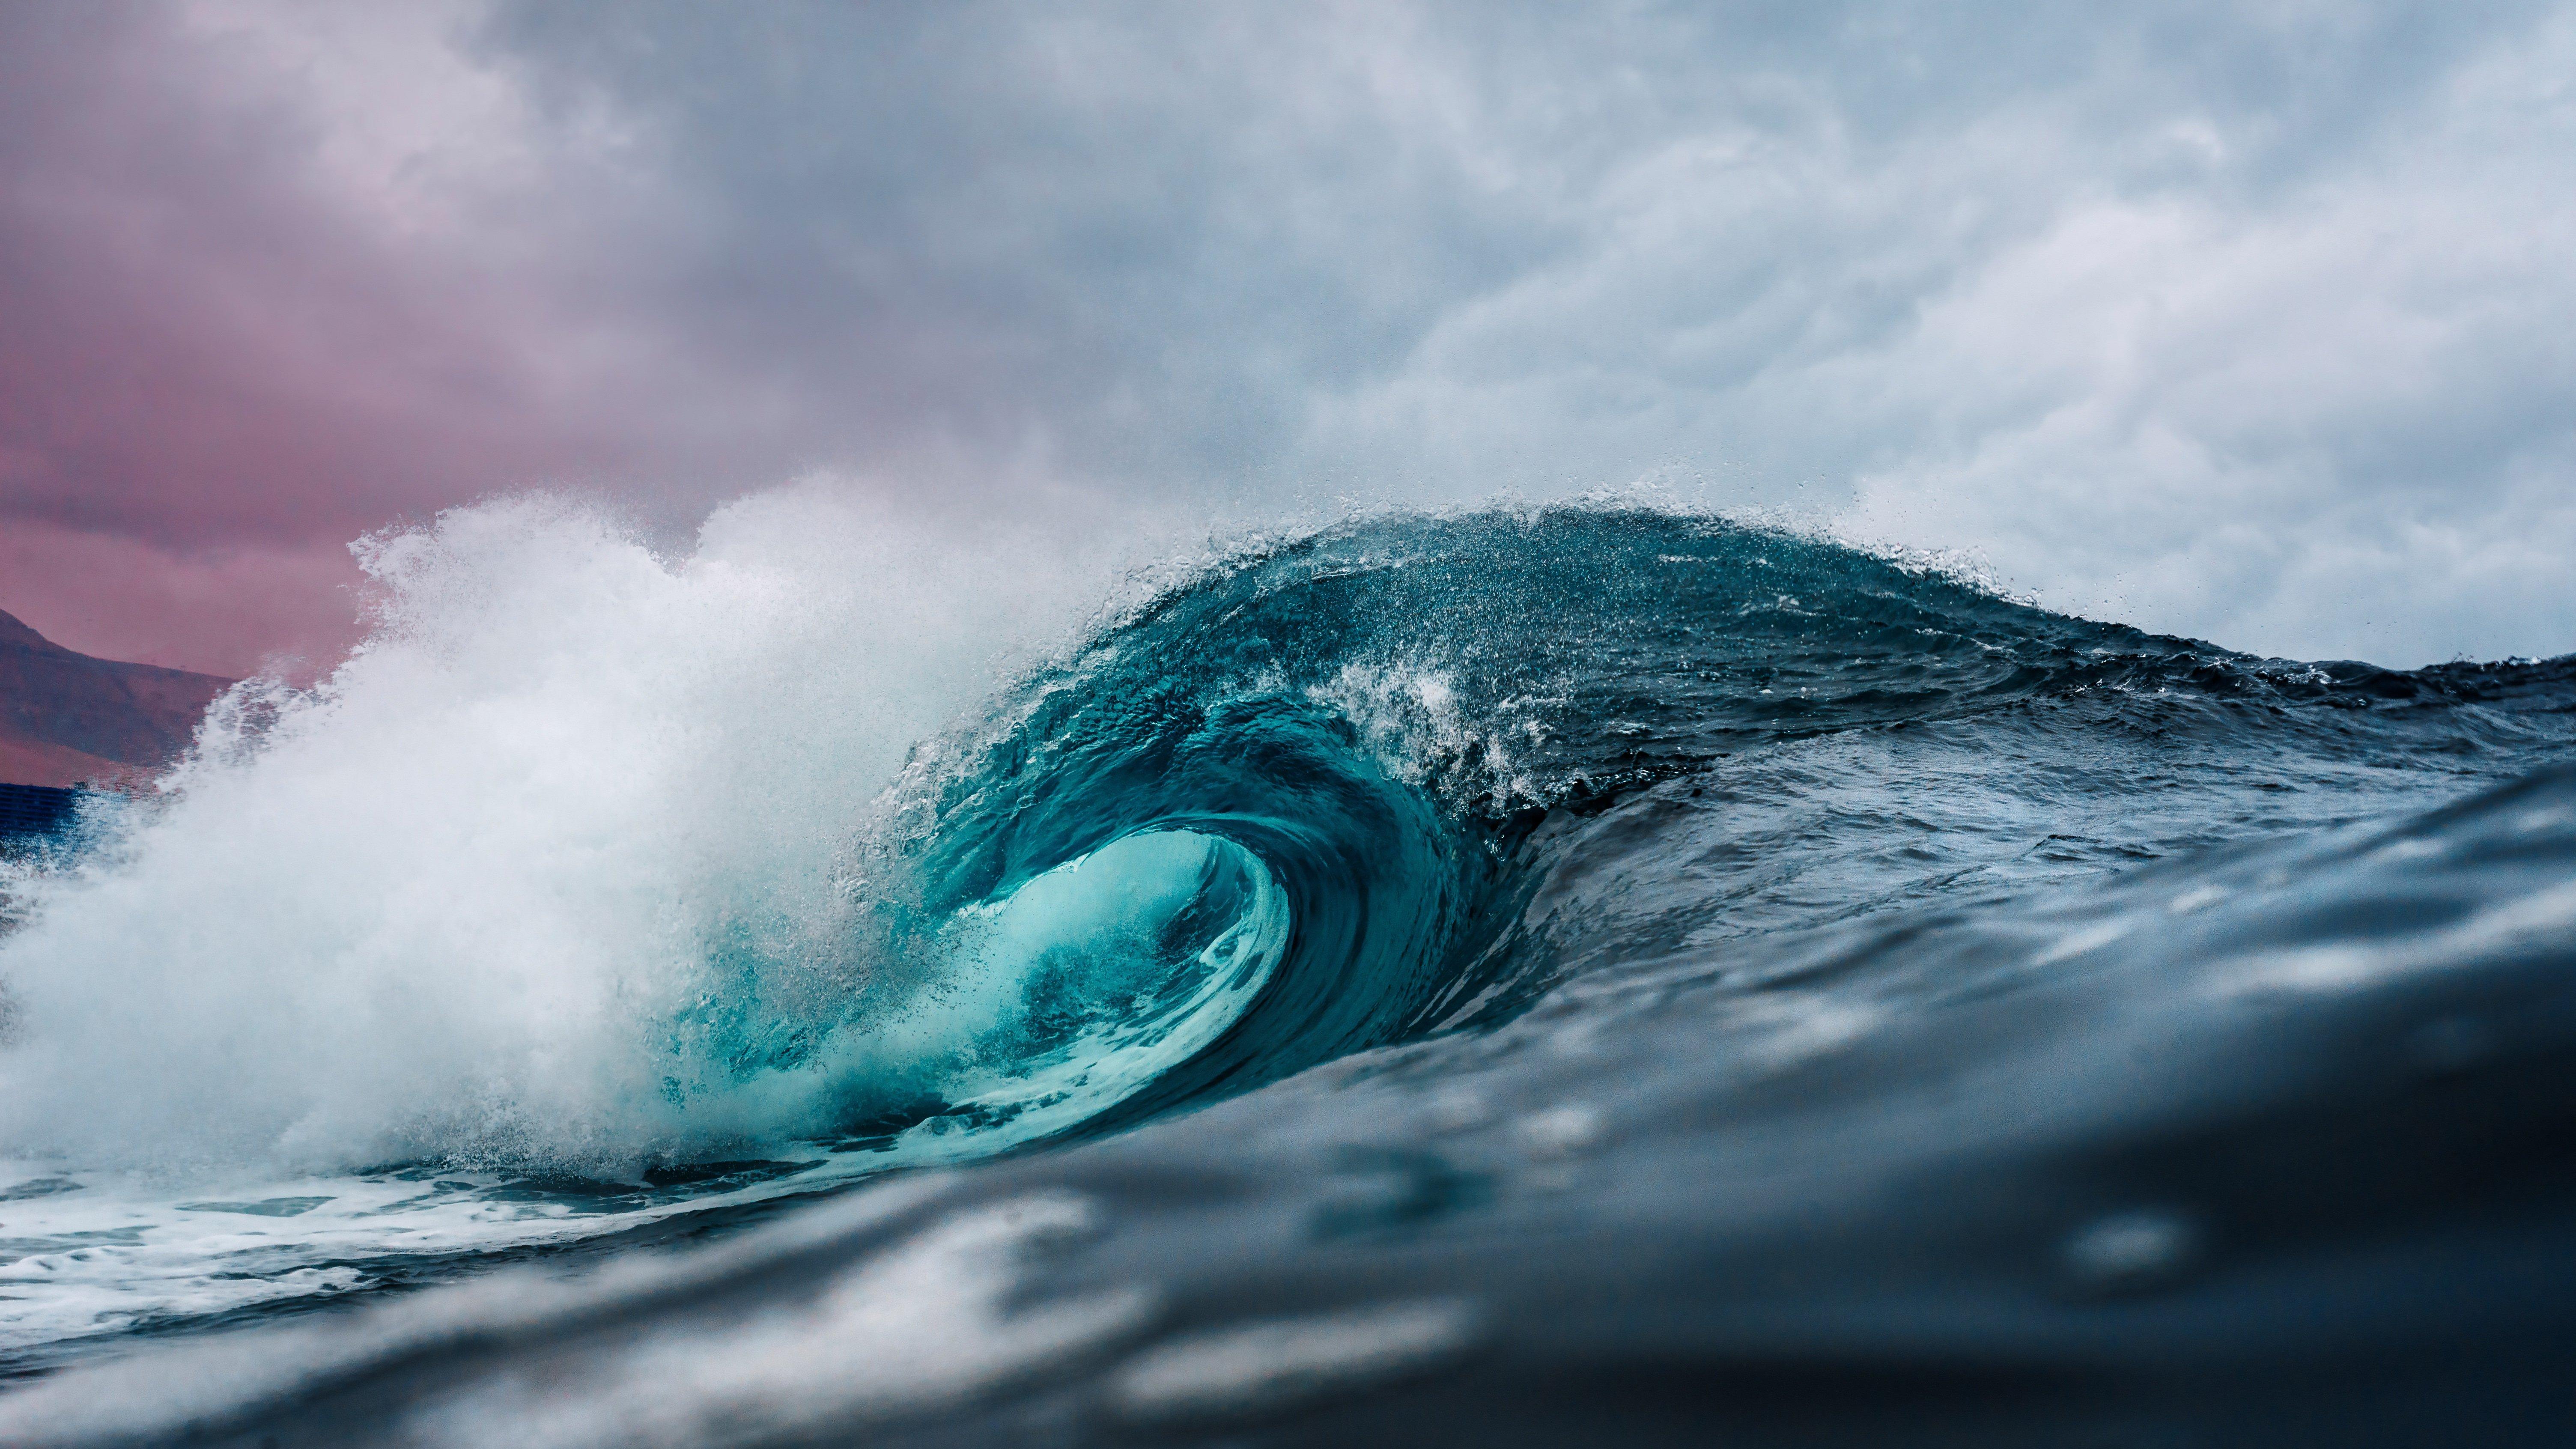 Wallpaper Big ocean wave